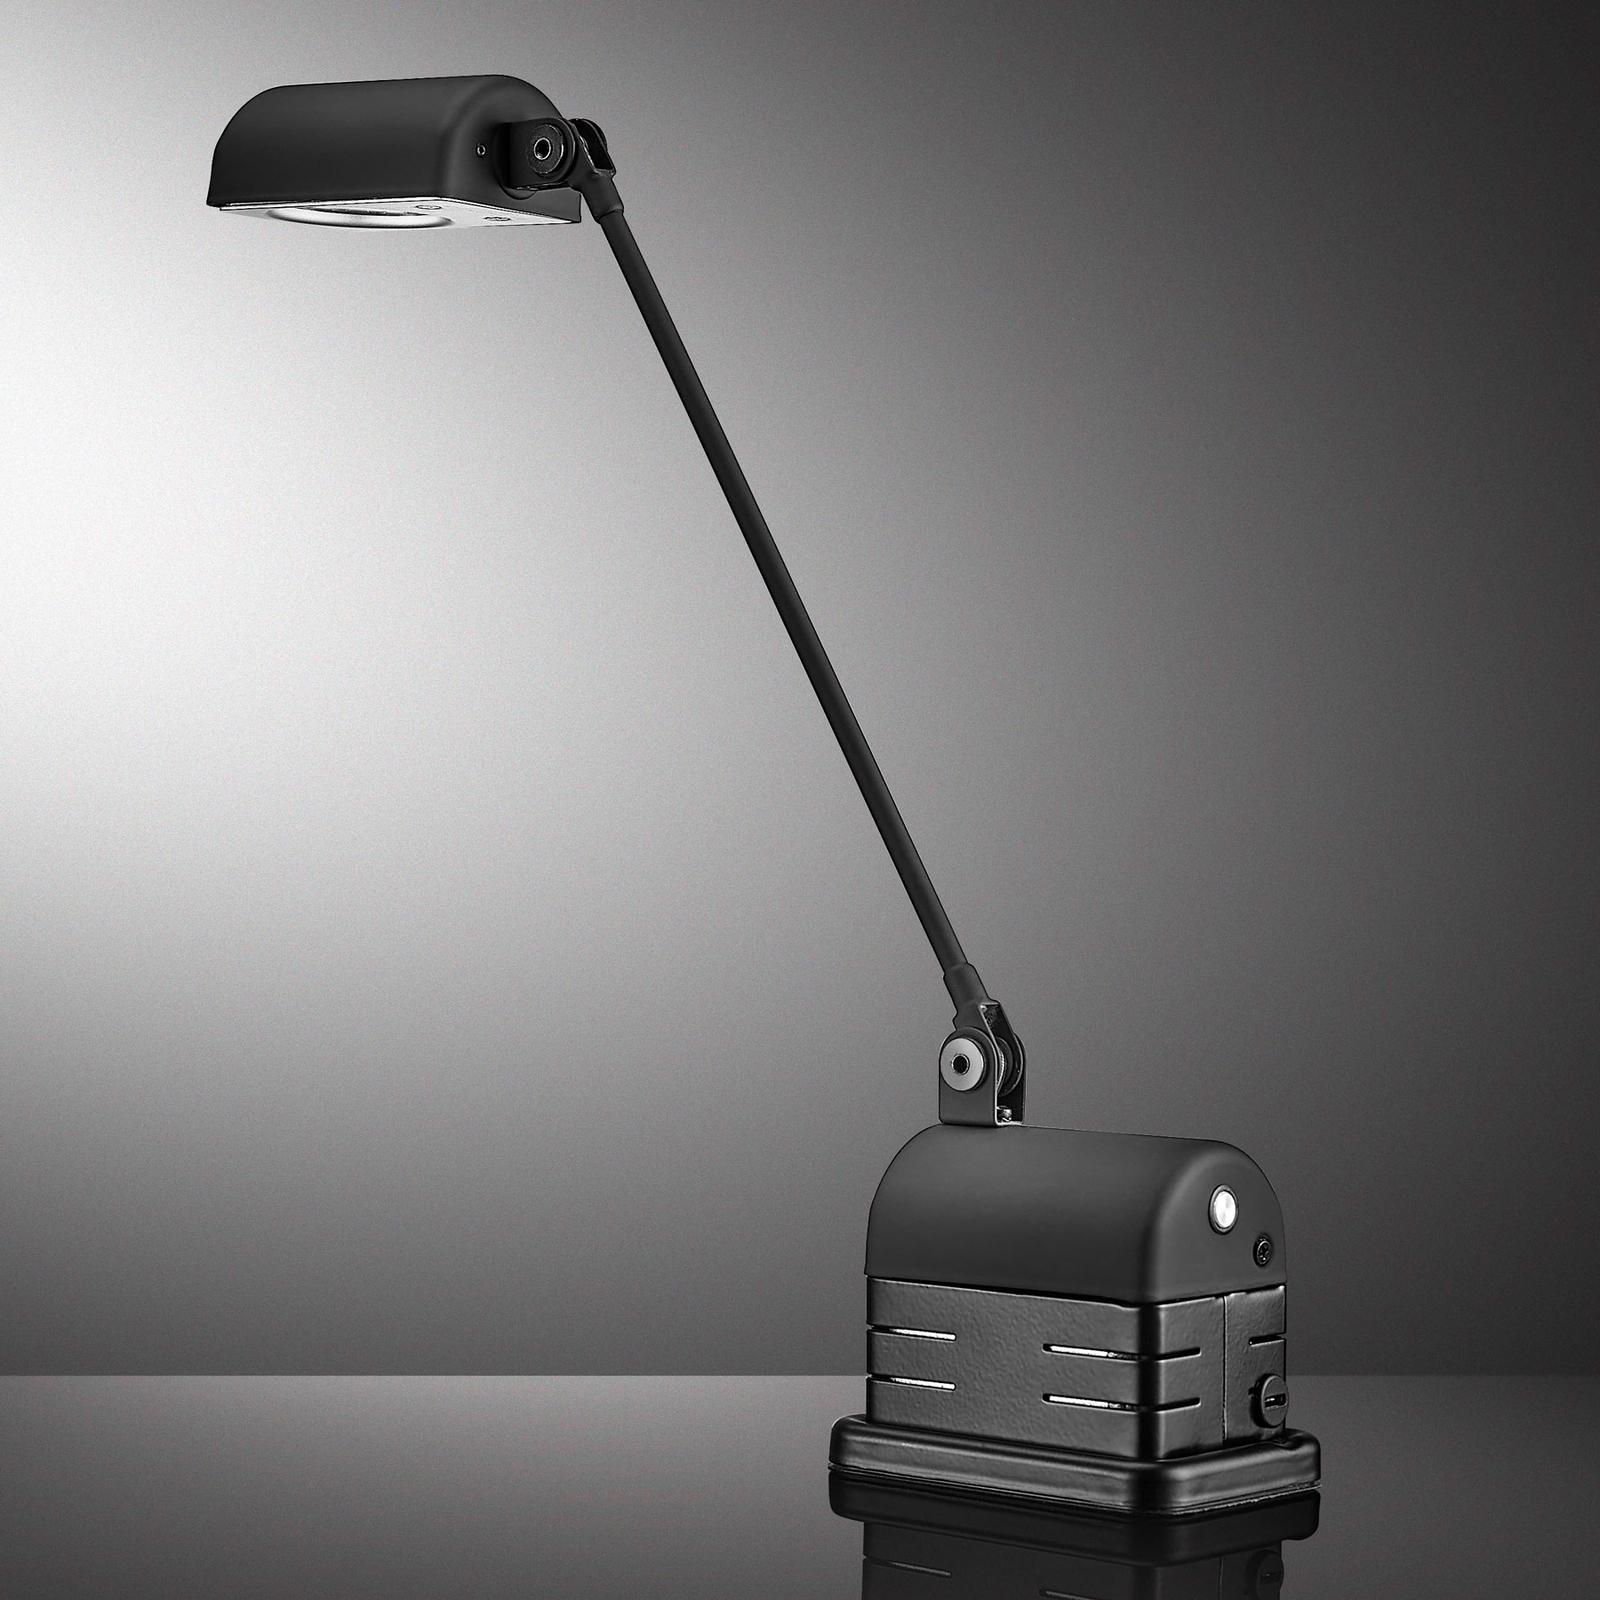 Lumina Daphinette Portatile 2700K, mattamusta